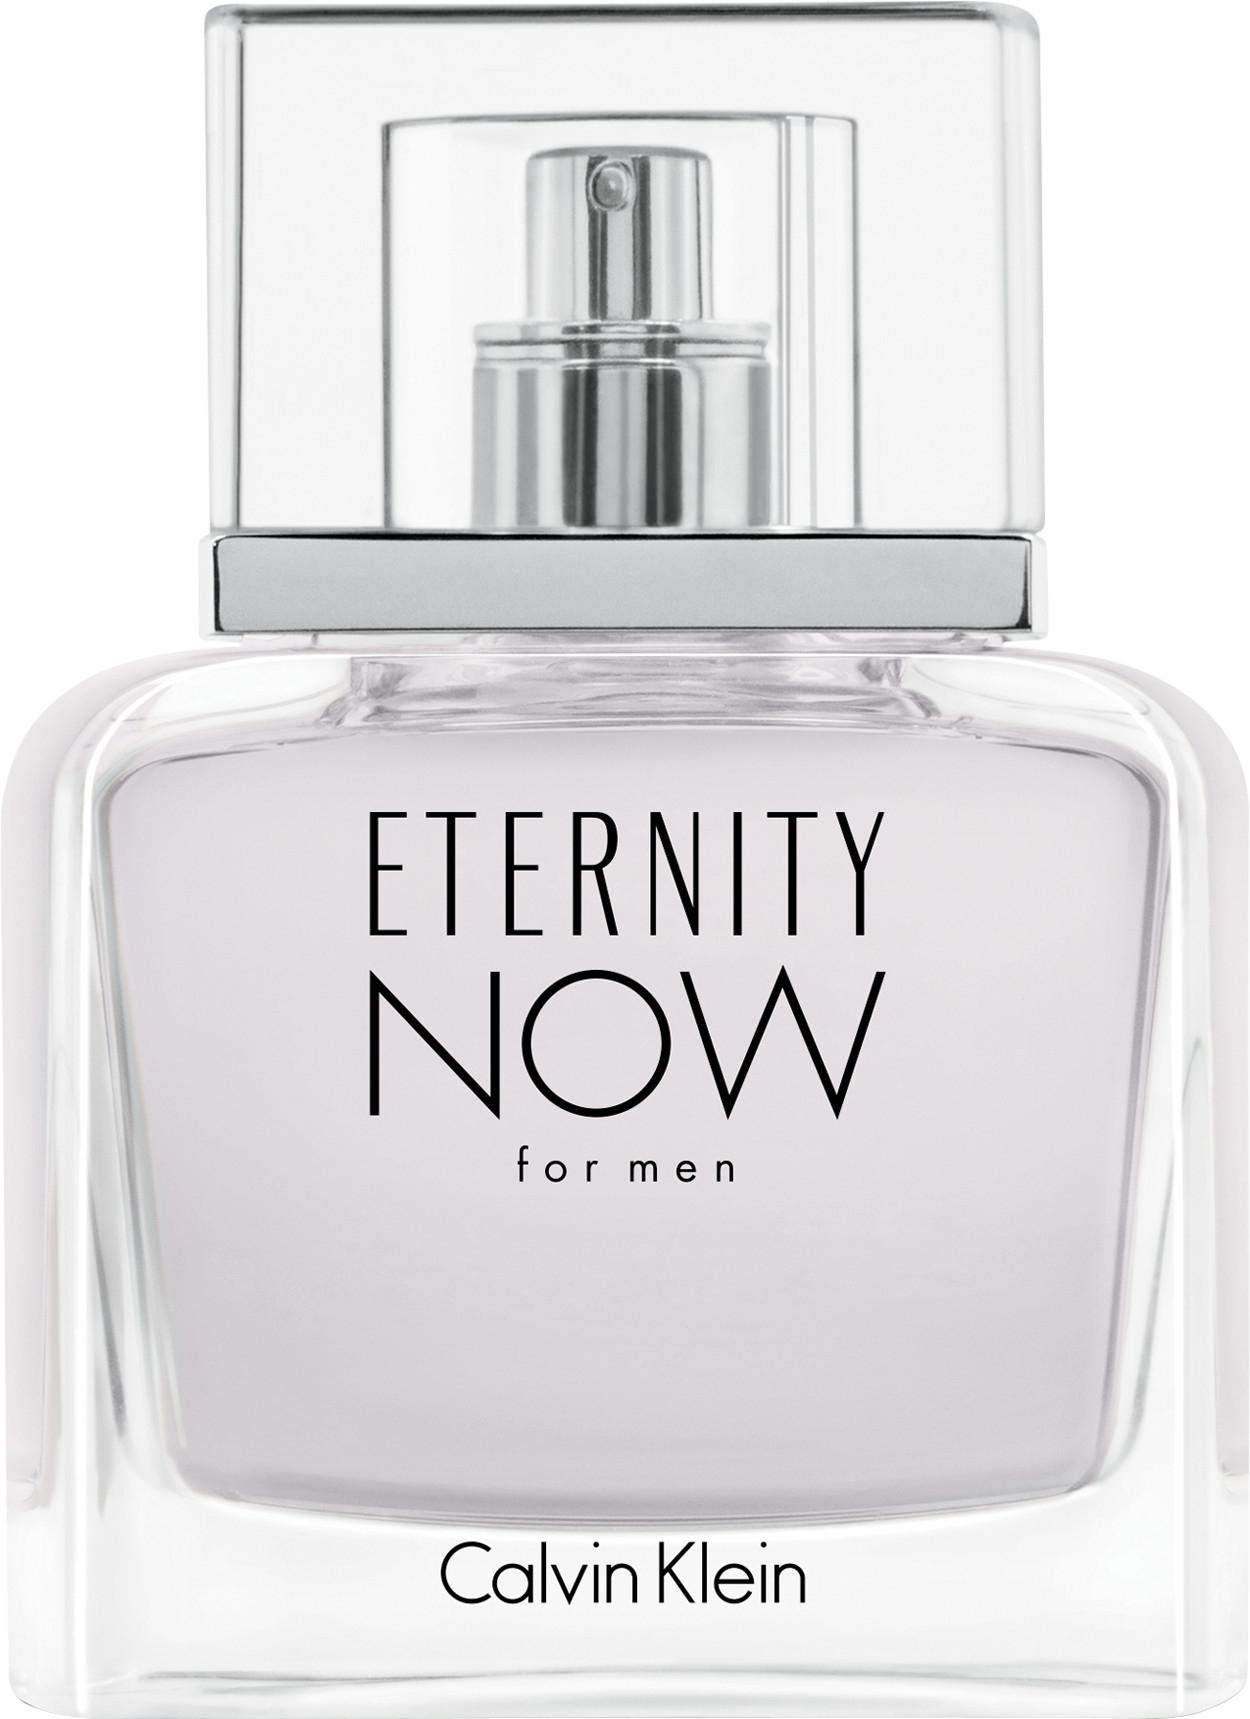 Calvin Klein Eternity Now (M) edt 100ml